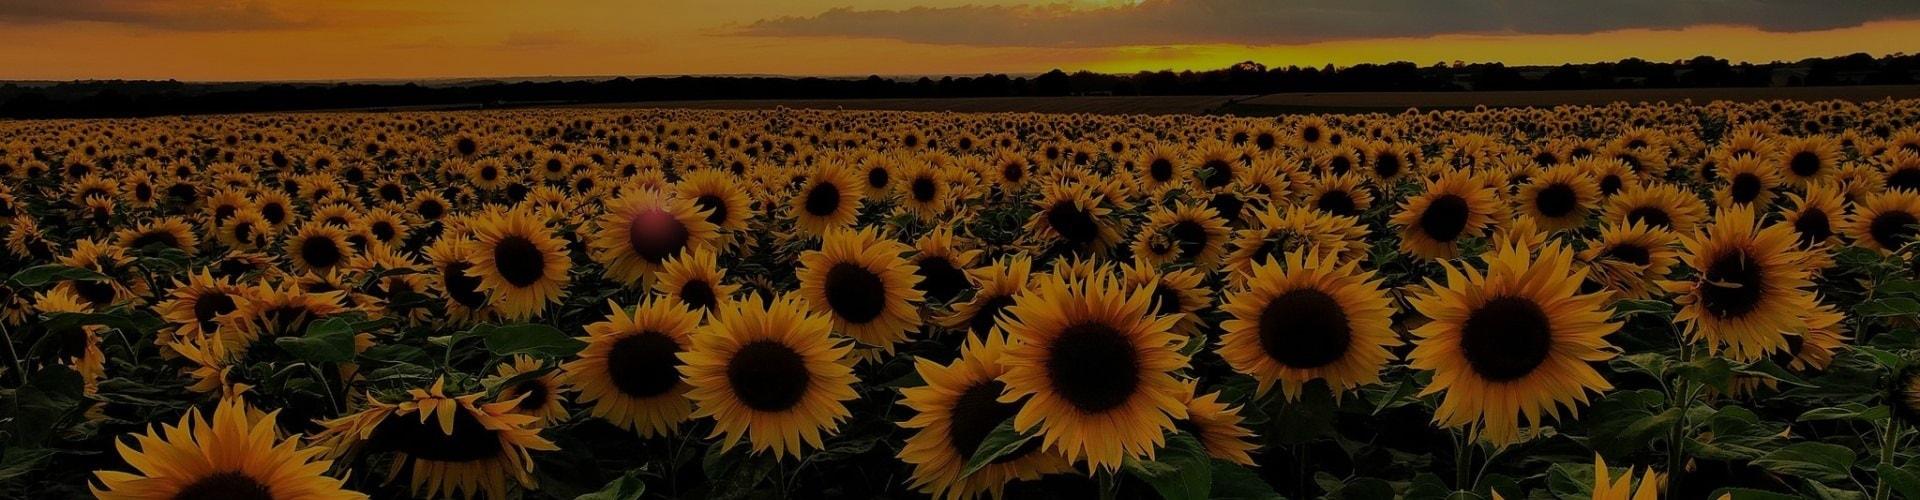 Helga pleven sunflowers